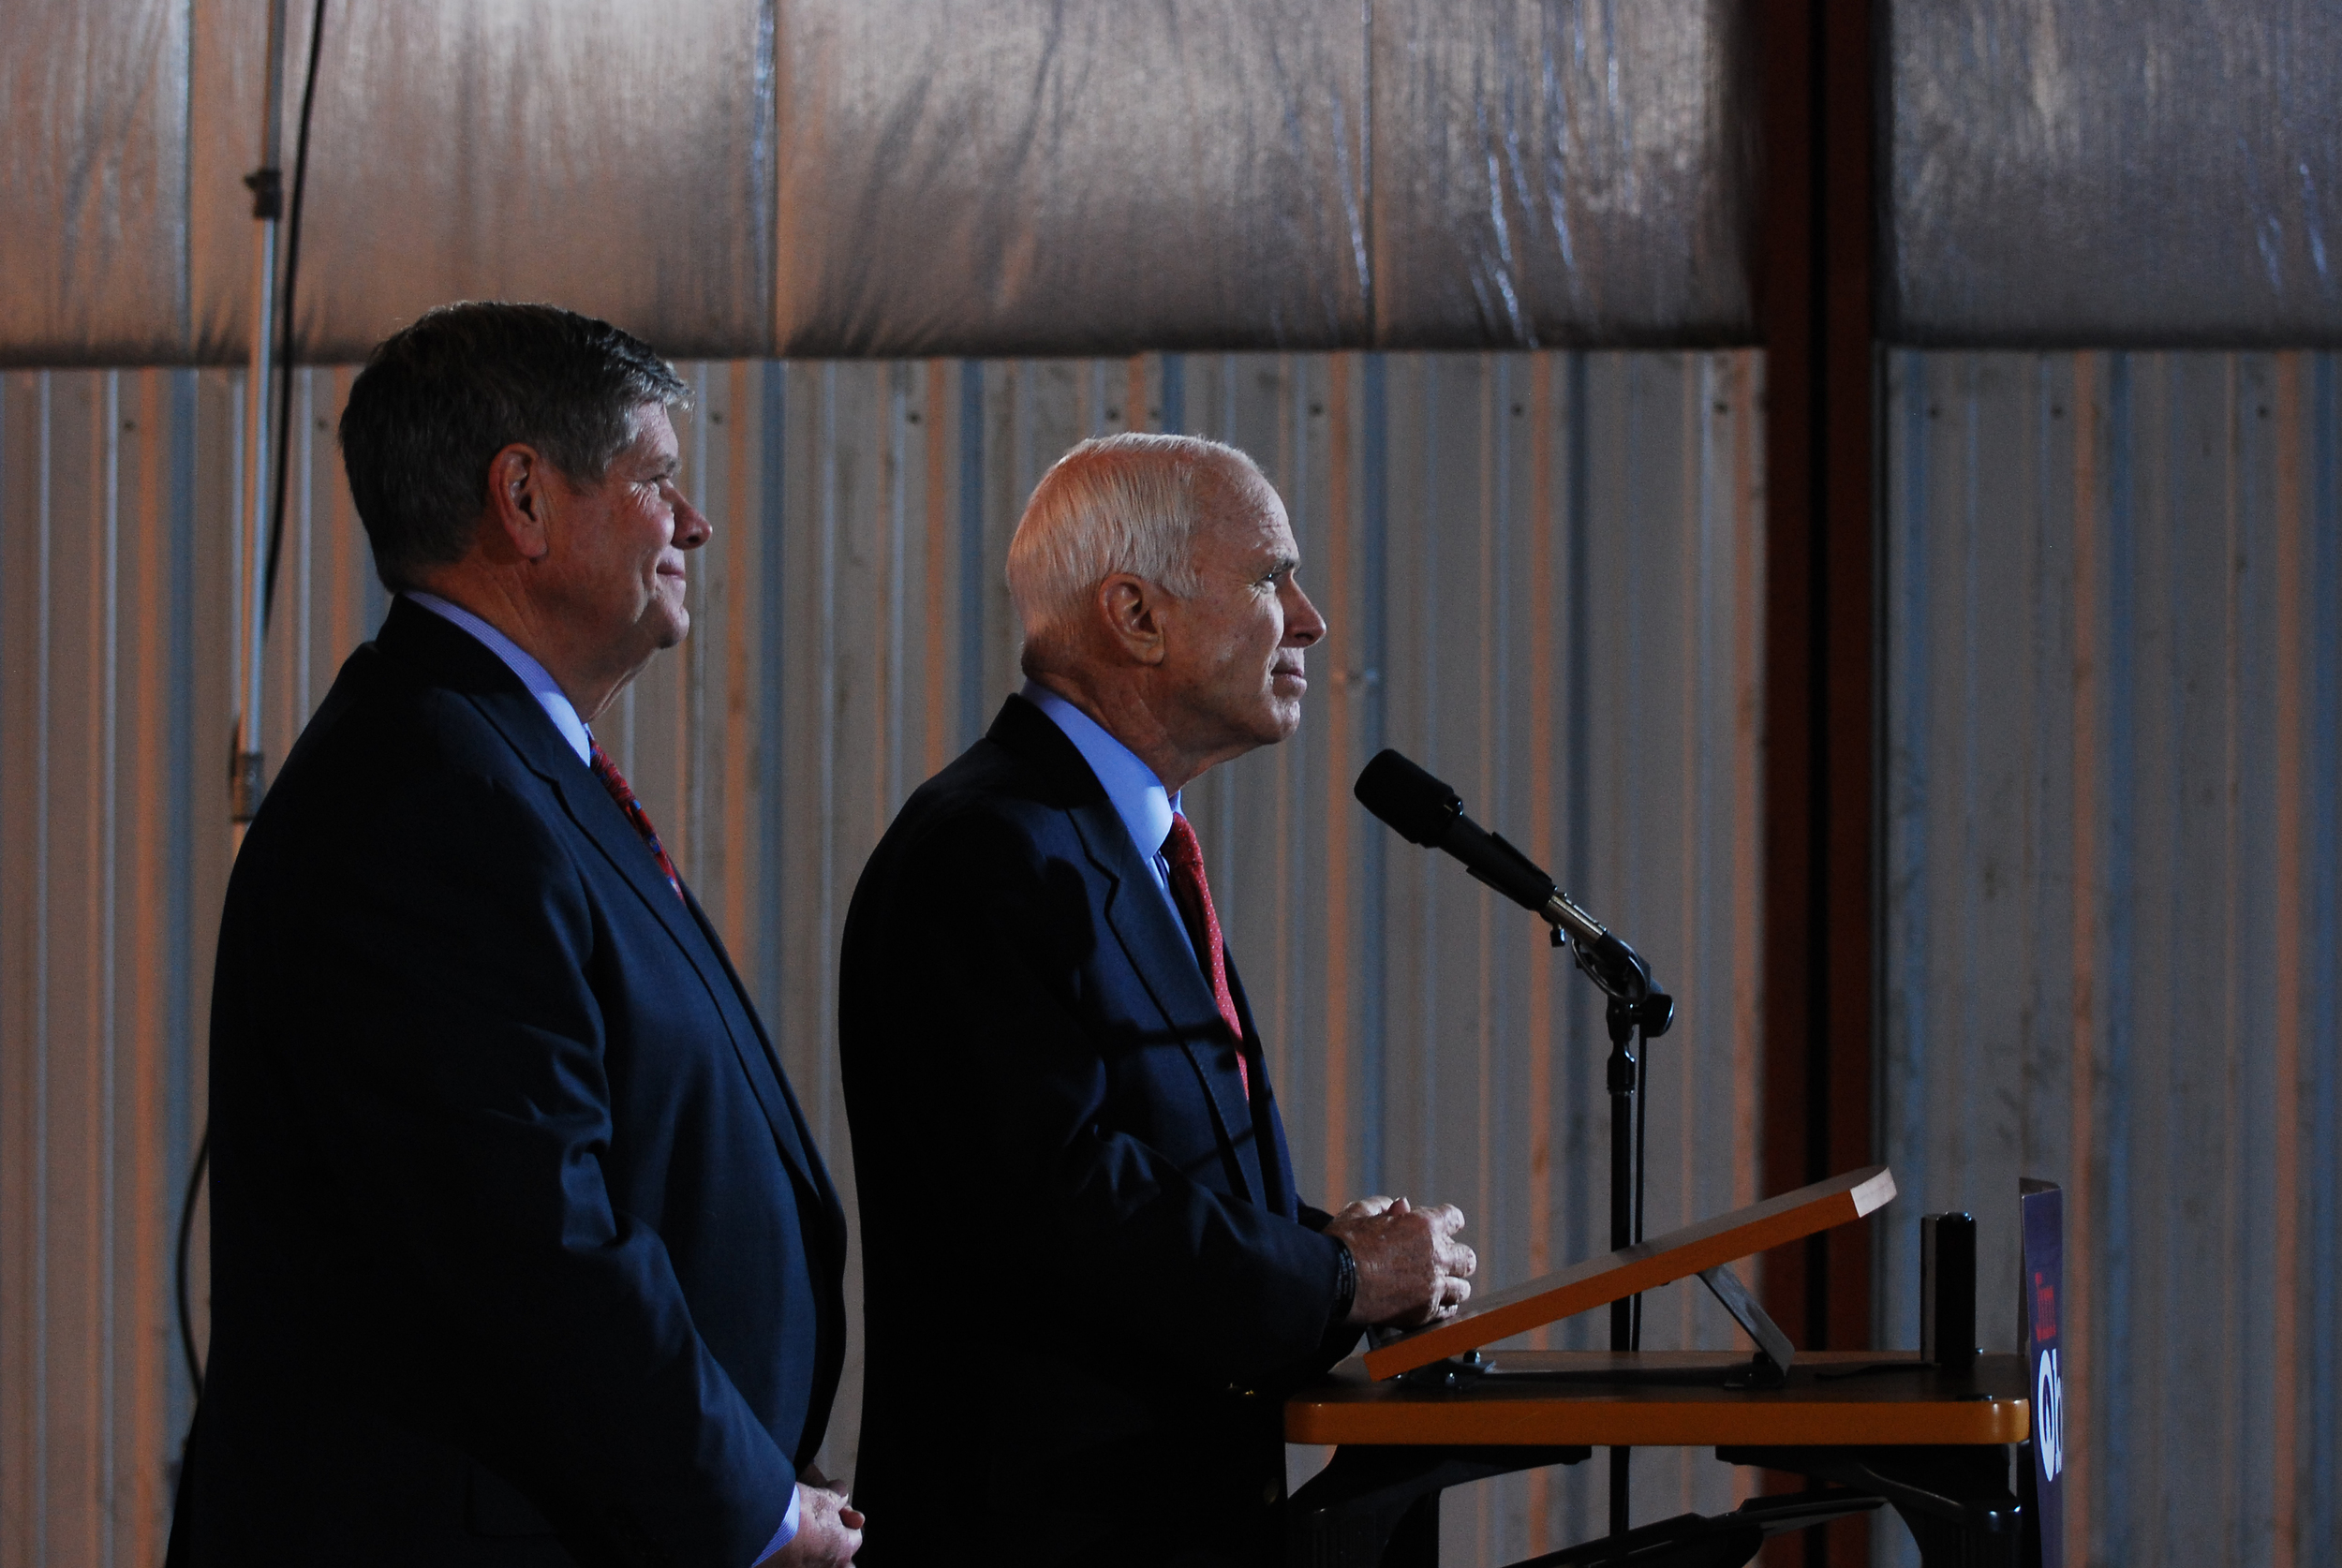 Jim Oberweis, John Mccain. 2008.